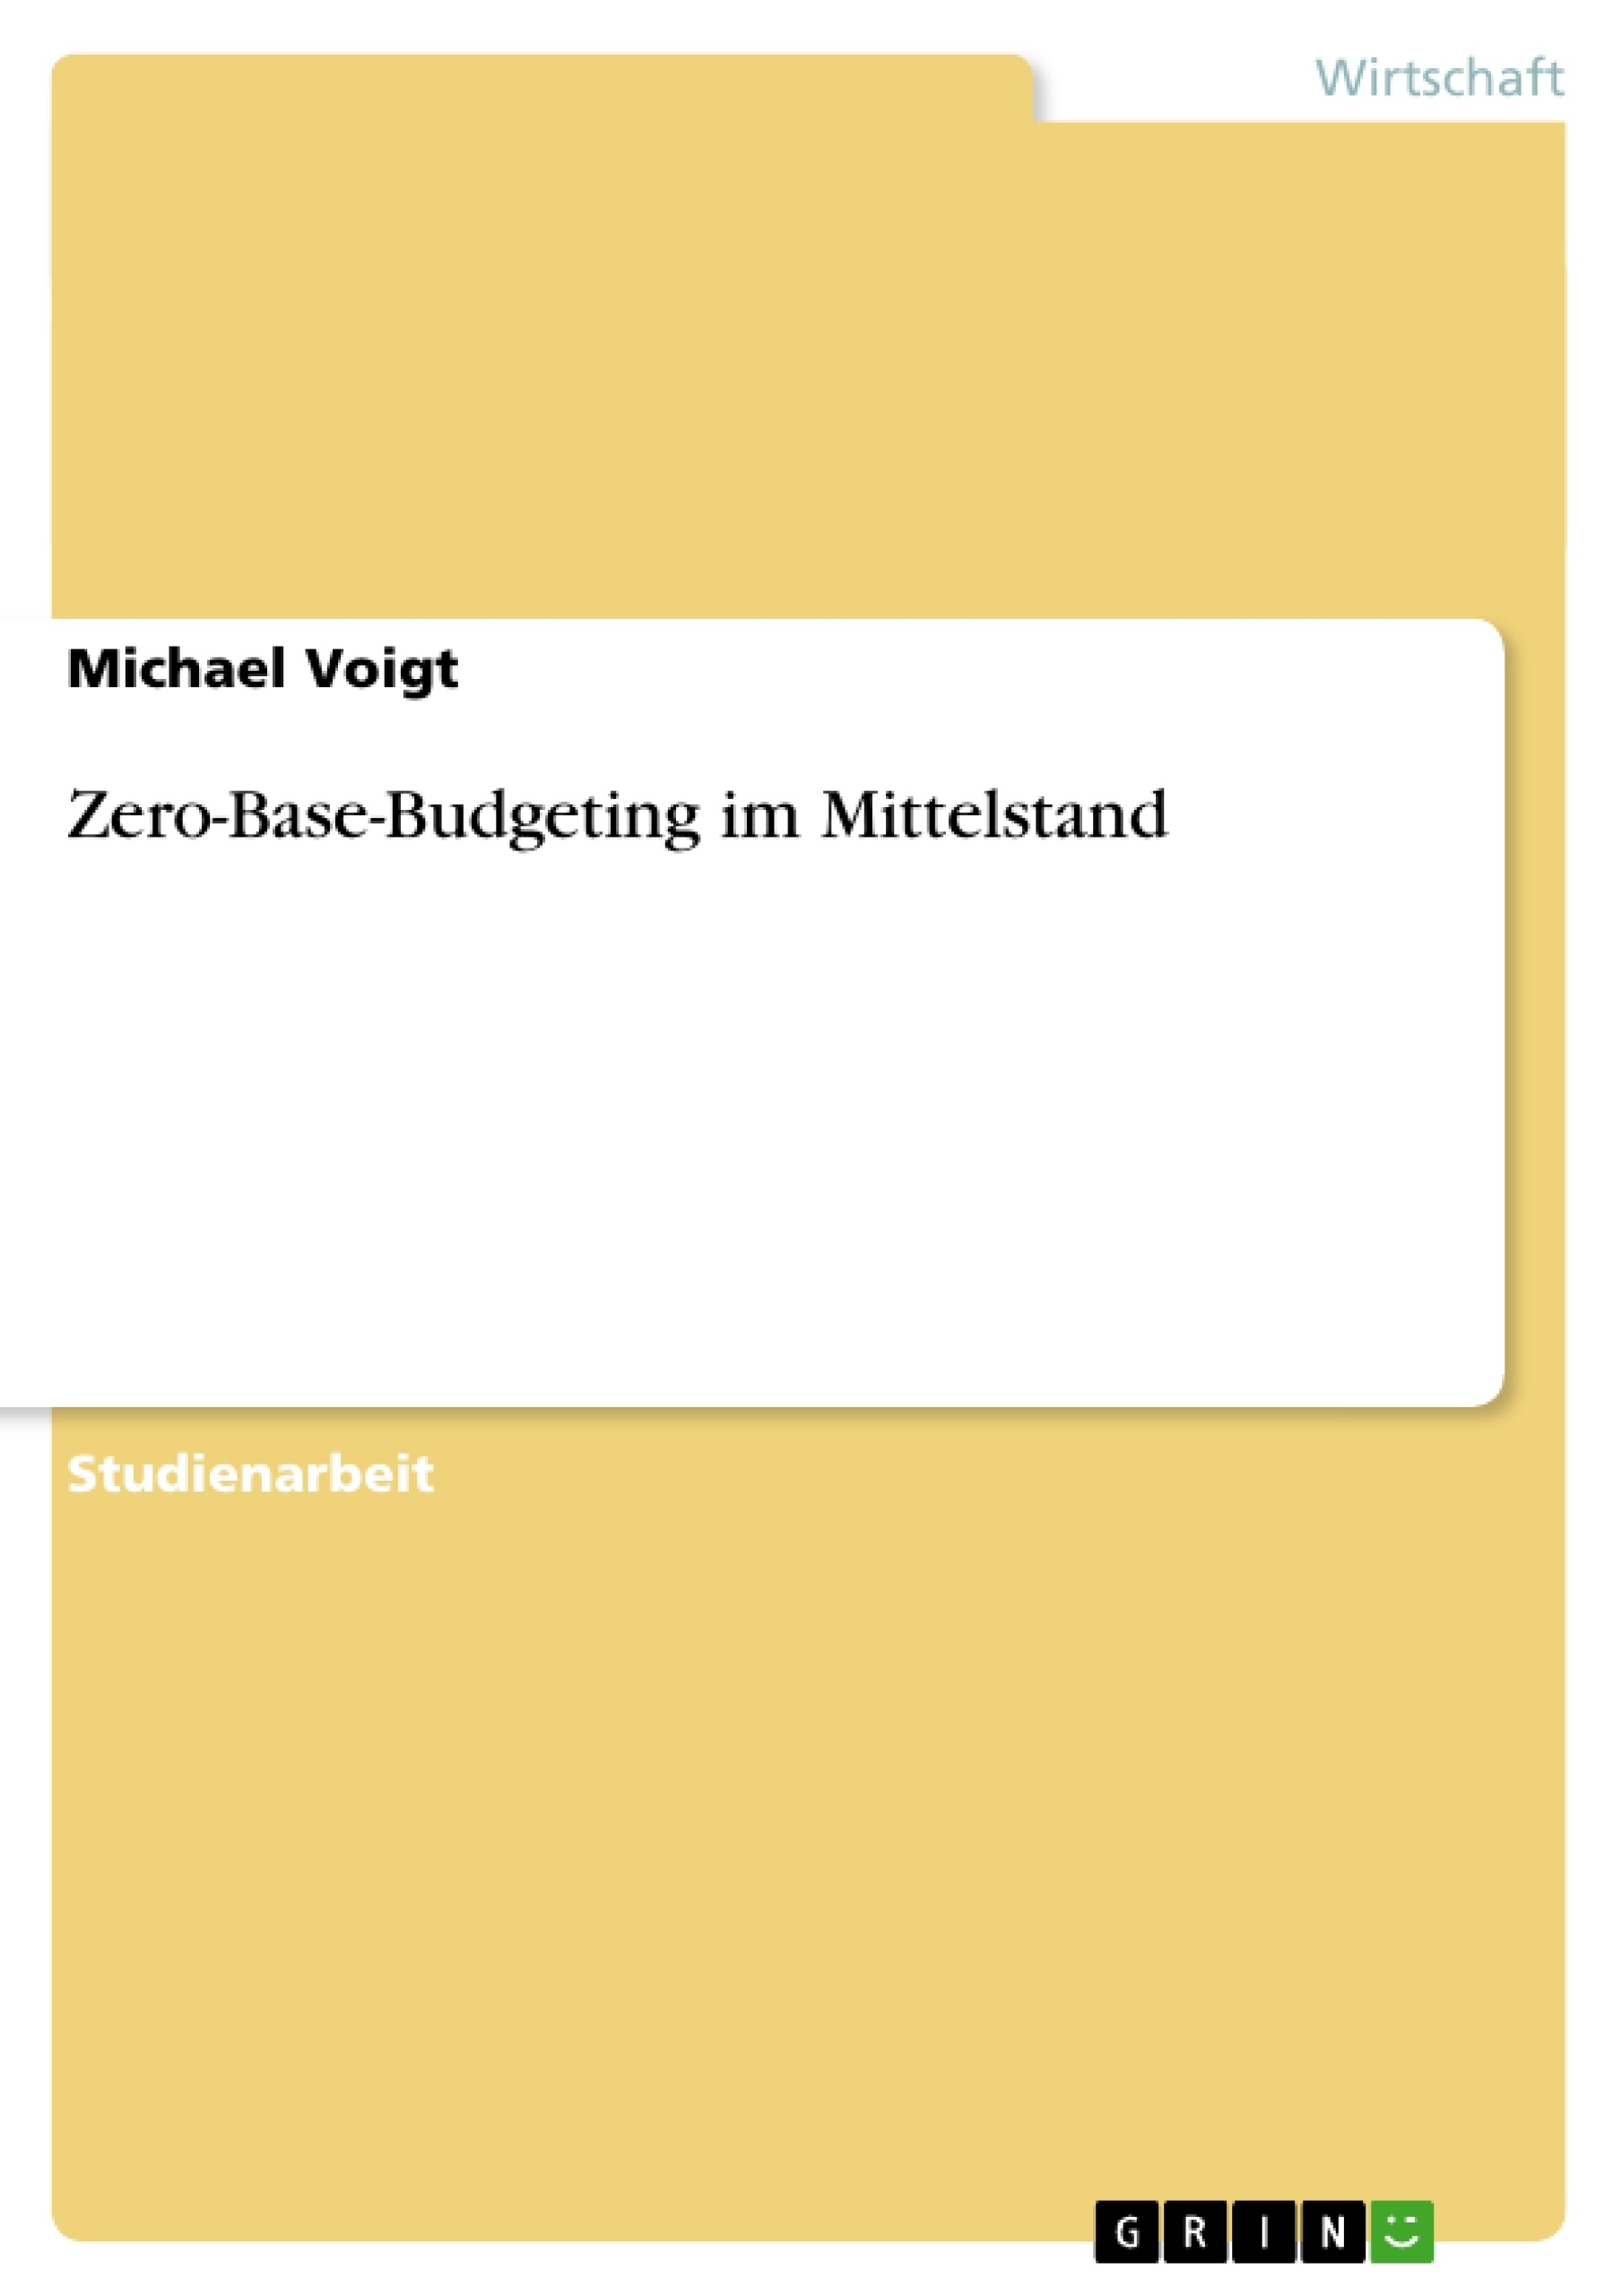 Titel: Zero-Base-Budgeting im Mittelstand